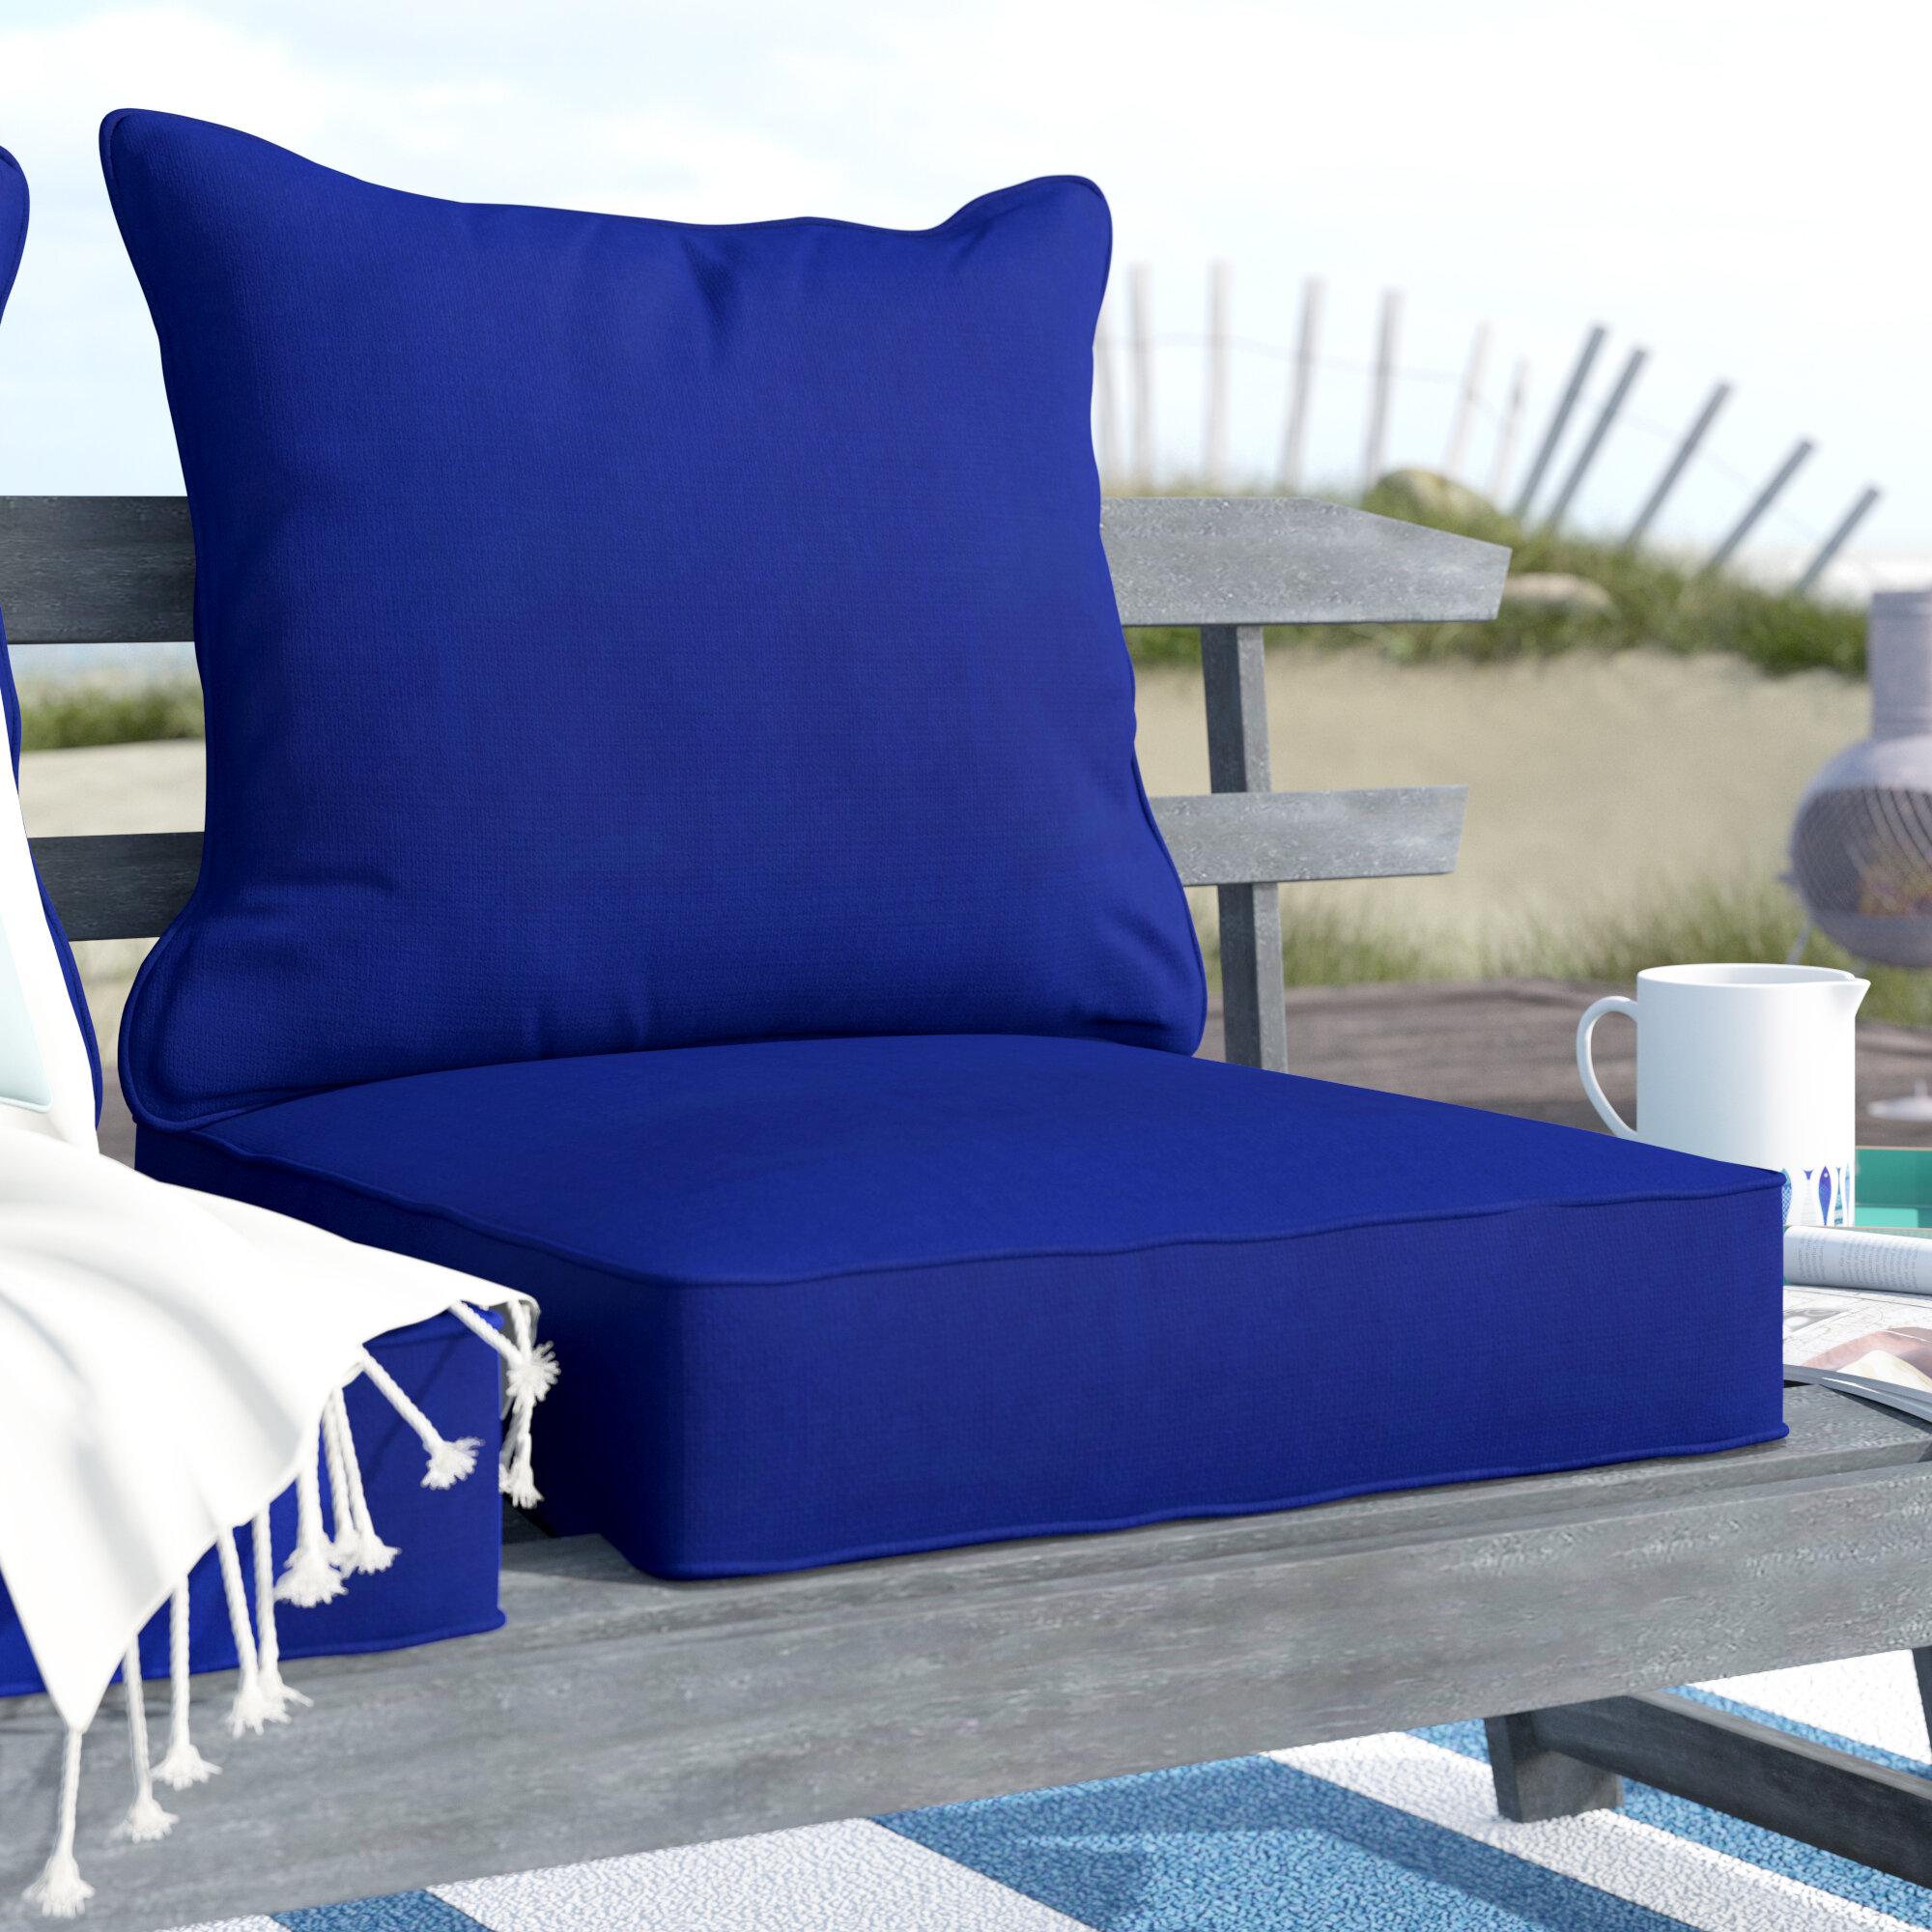 Indoor Outdoor Chair Cushion Set